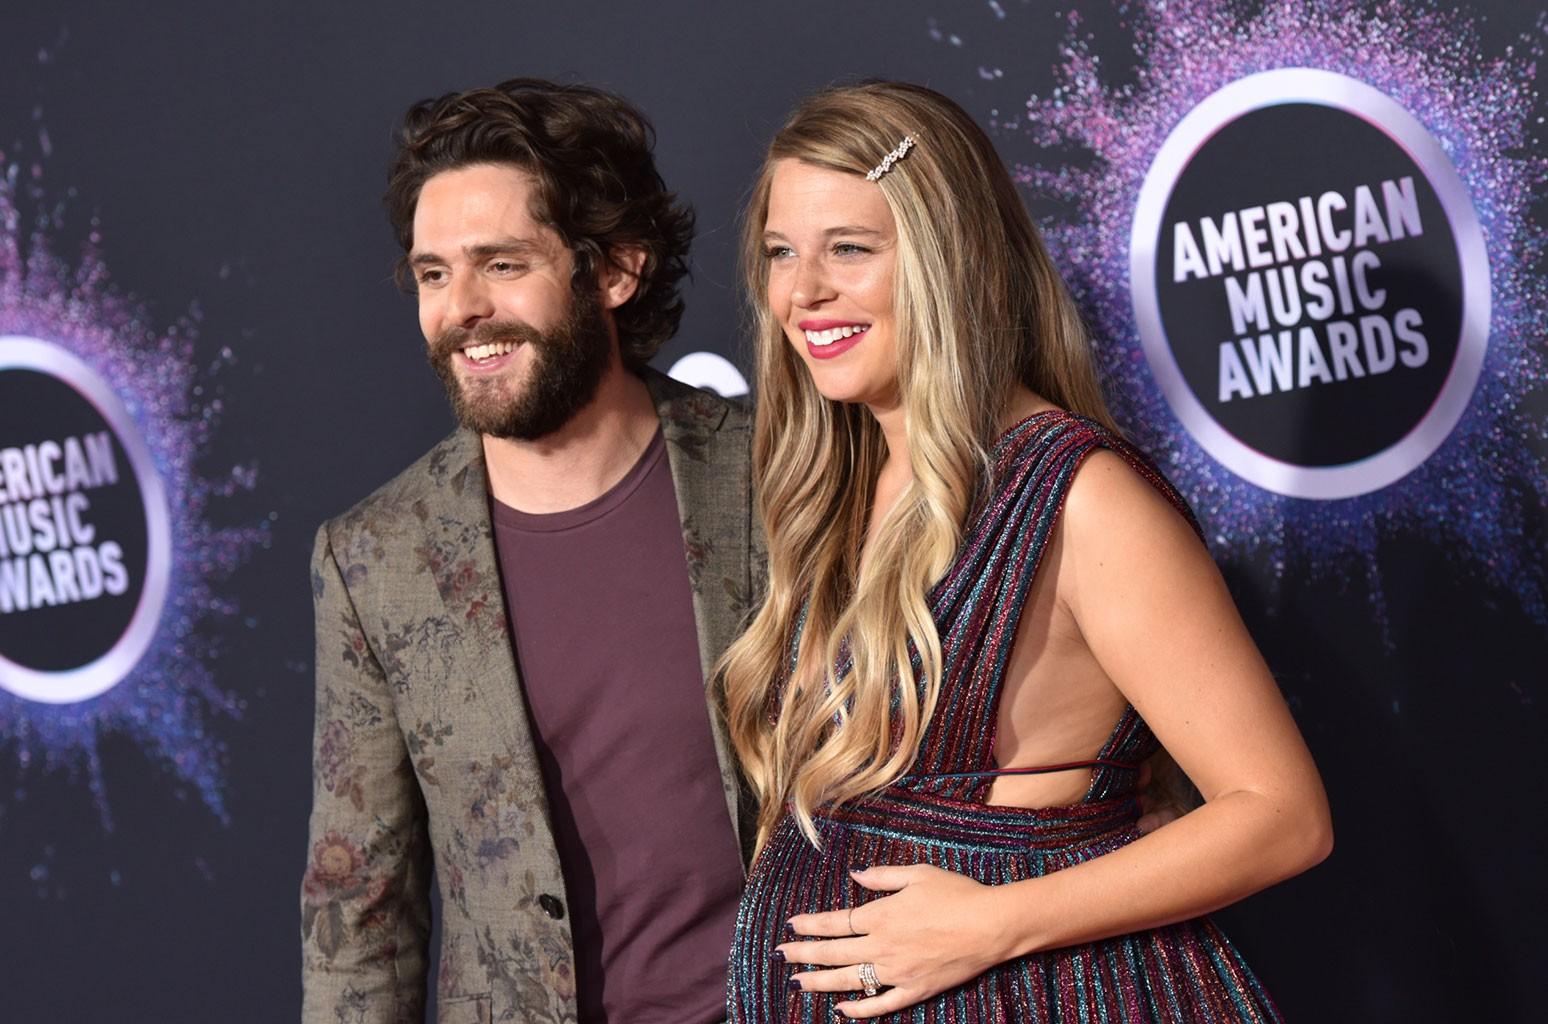 The 2020 Cma Country Christmas Thomas Rhett & Wife Lauren Akins to Host 'CMA Country Christmas